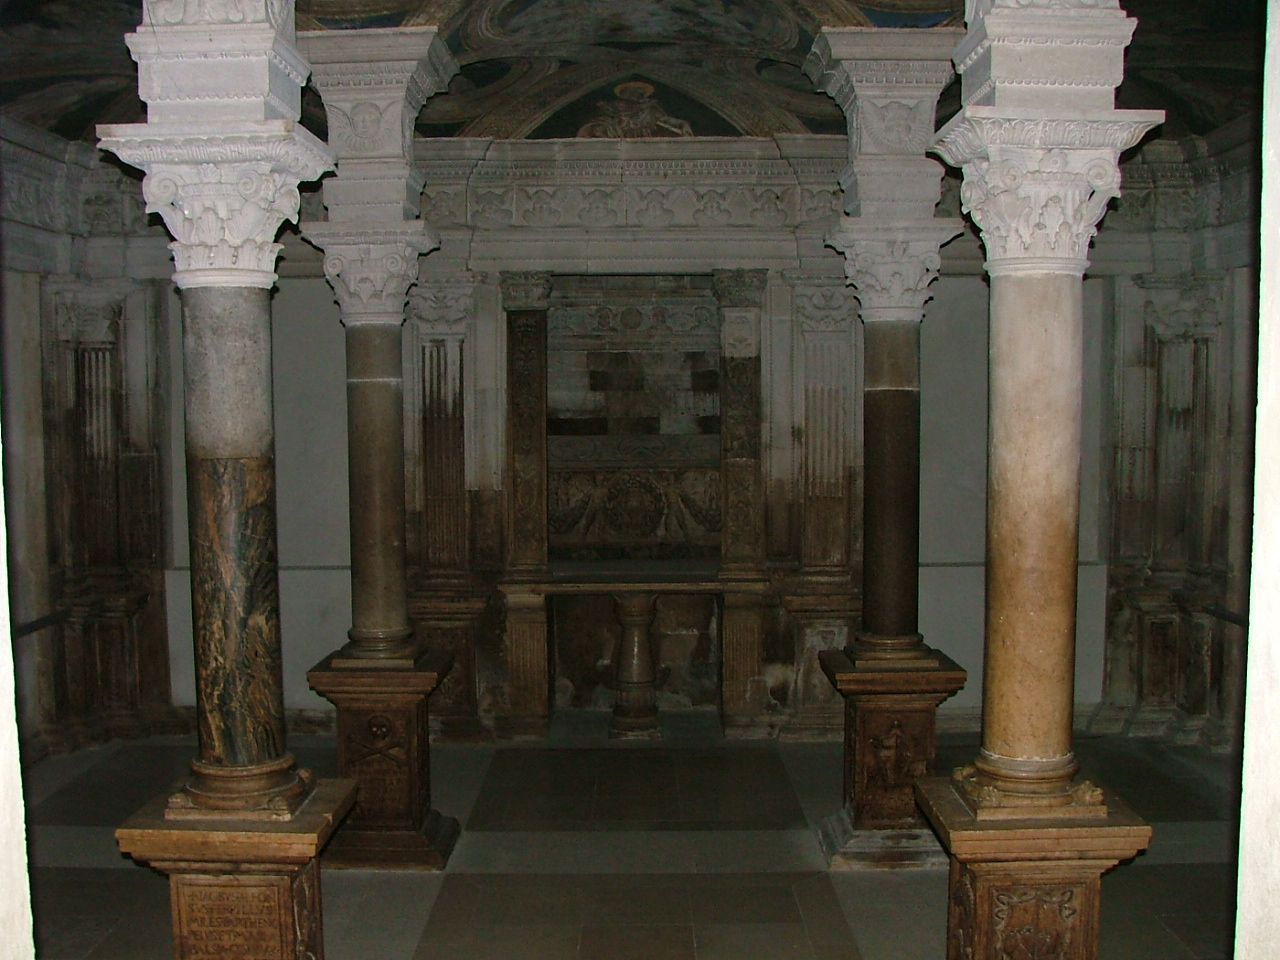 Cattedrale di Acerenza - Cripta